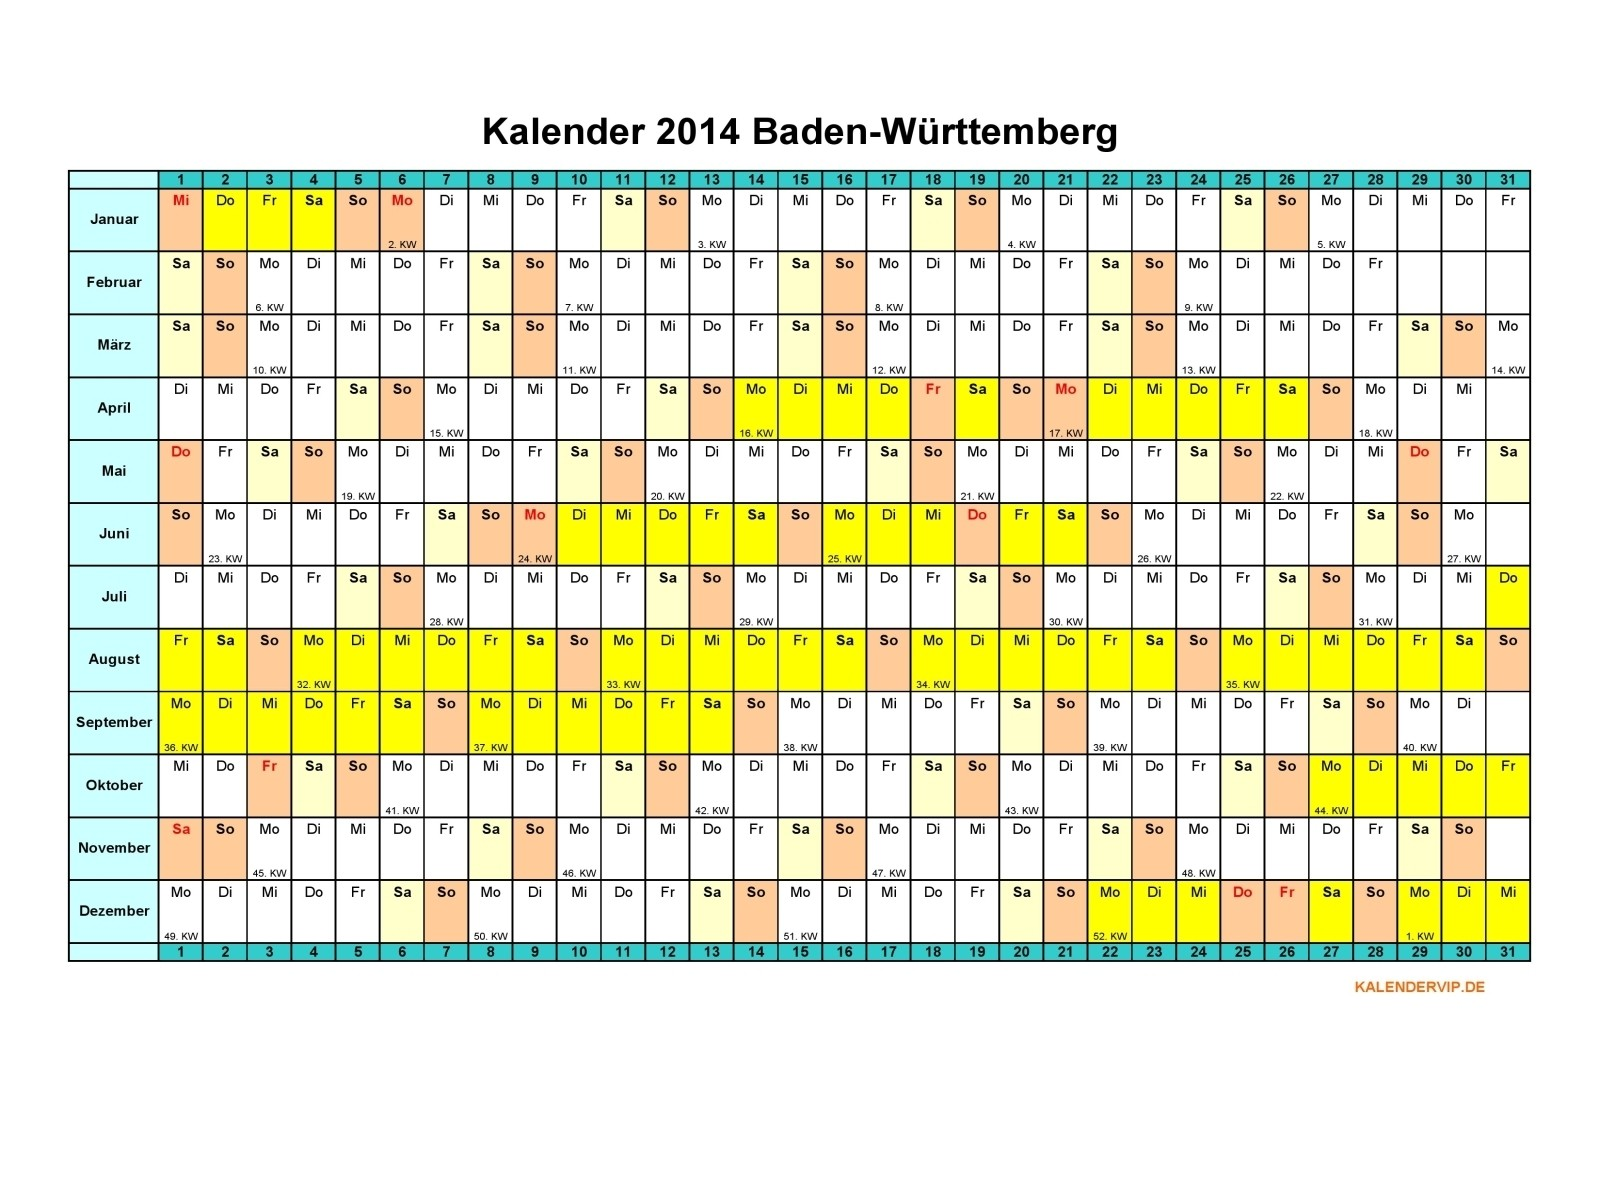 kalender 2014 baden wuerttemberg